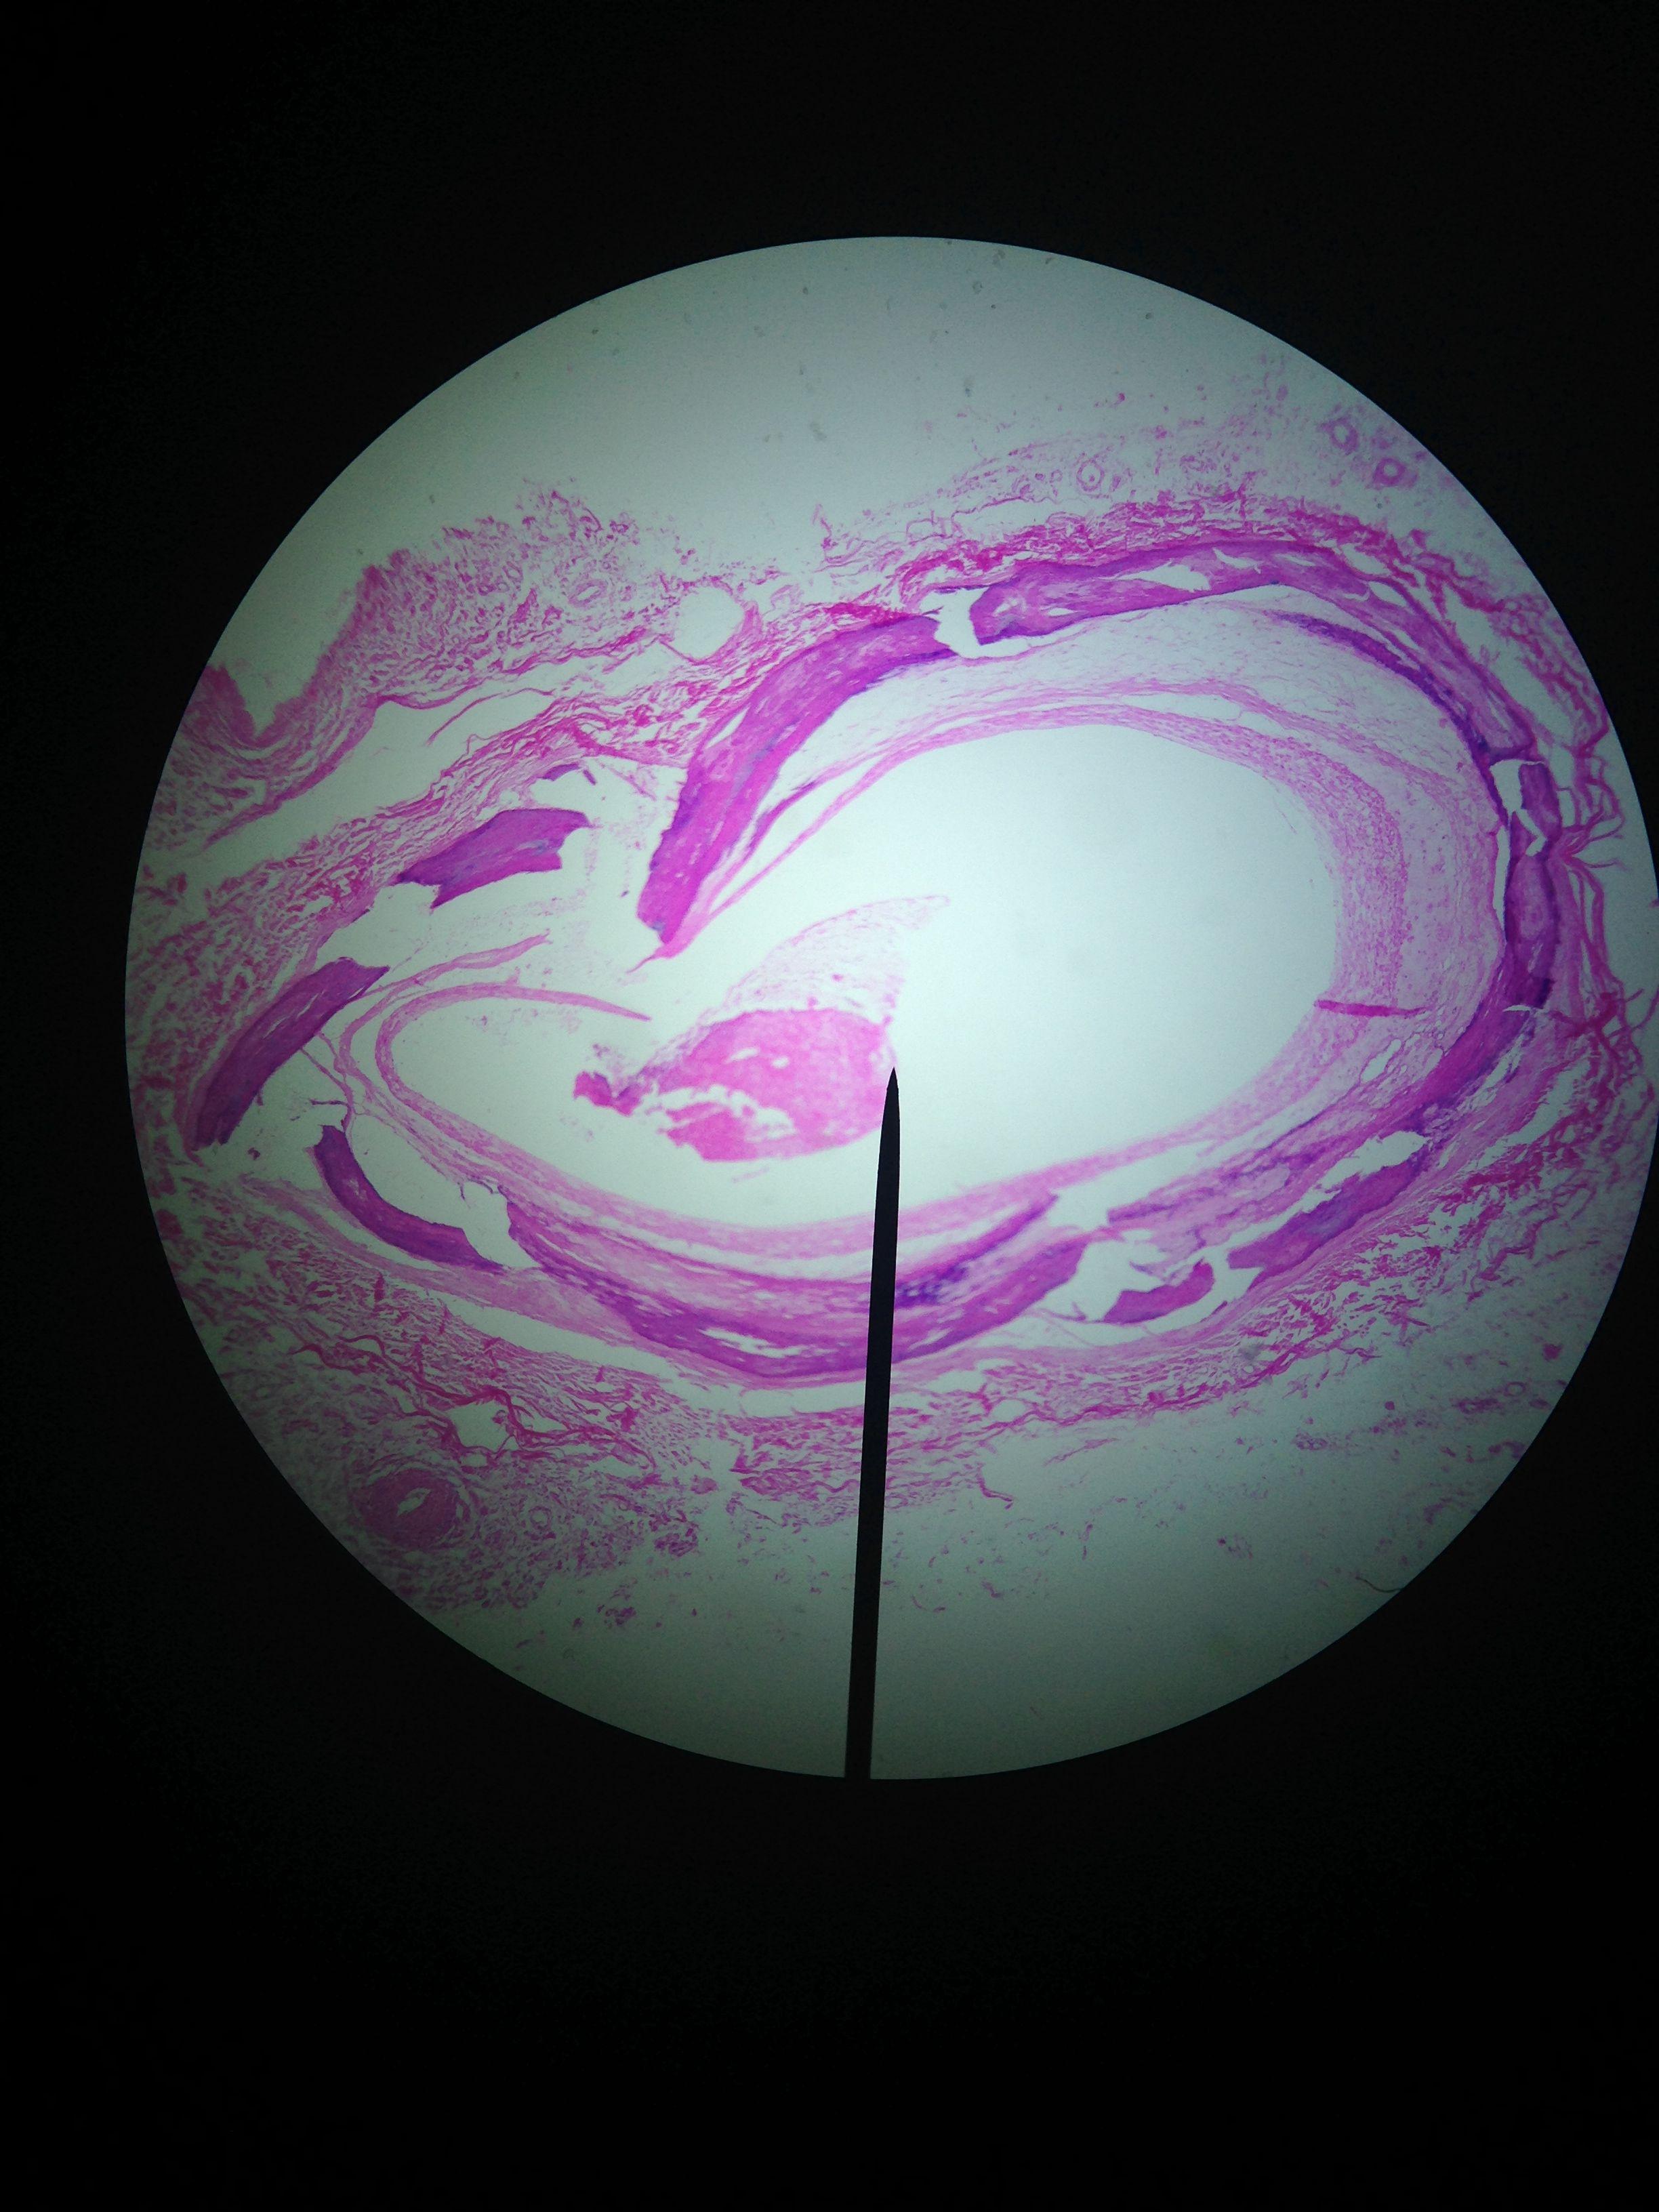 Human Atherosclerosis Coronary C S Pathology Cardiovascular